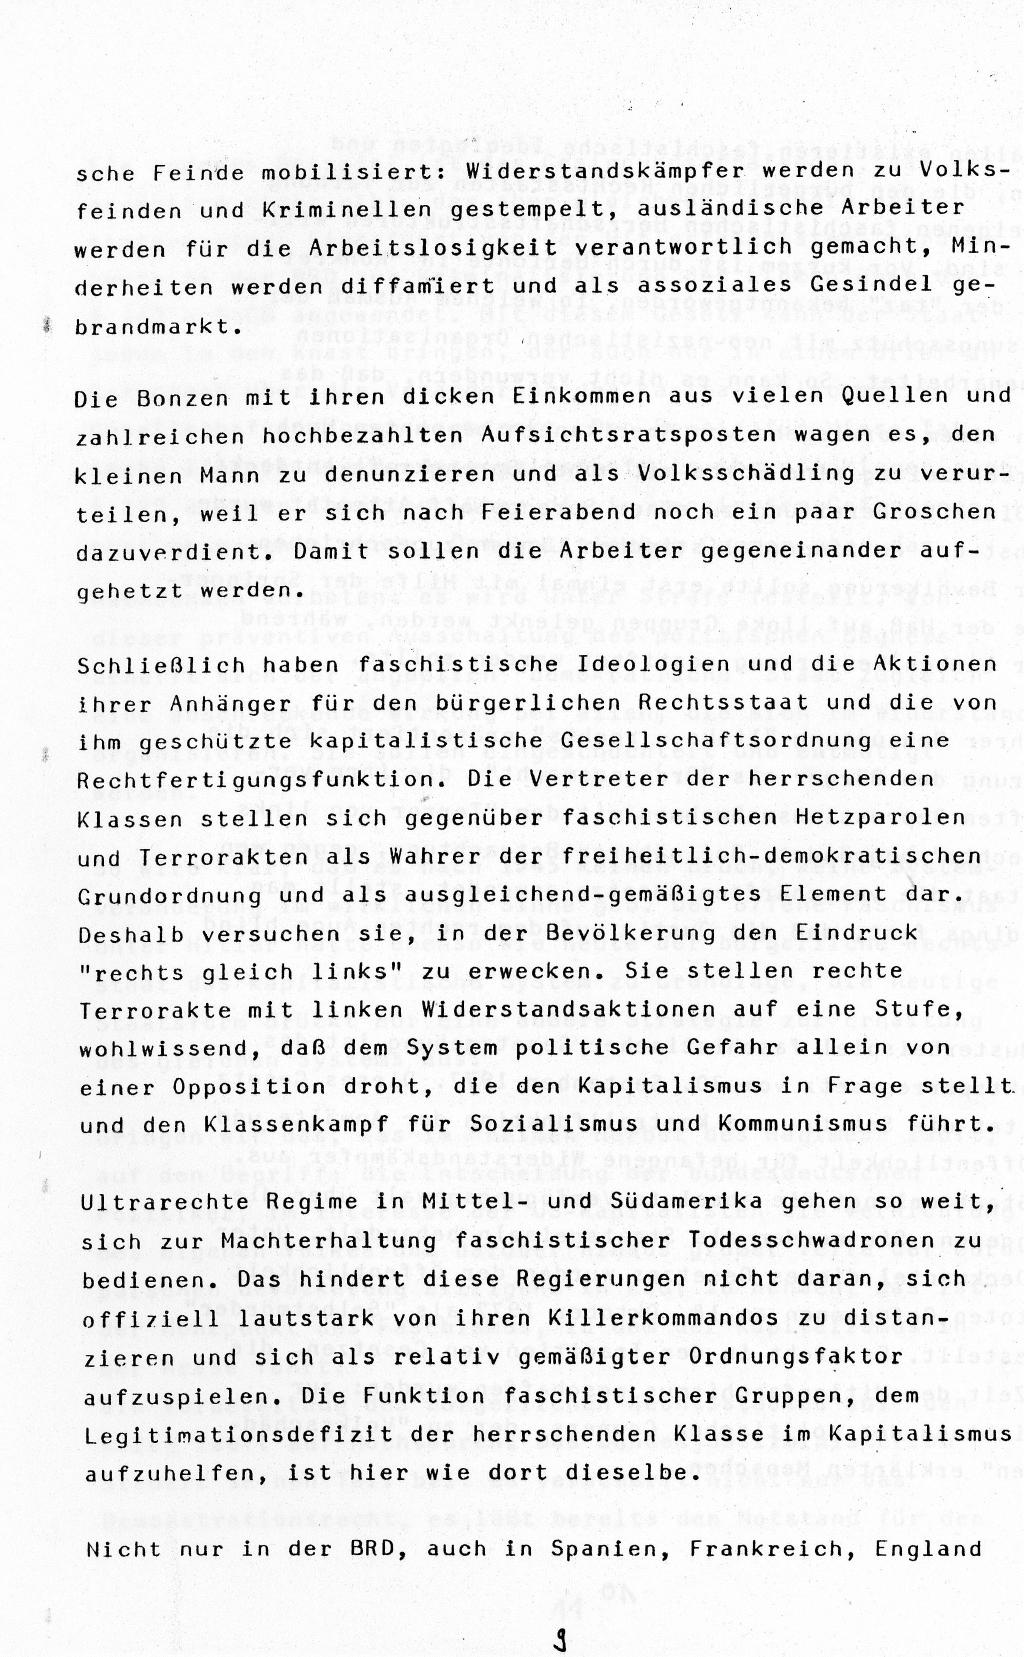 Berlin_1983_Autonome_Gruppen_Faschismus_im_Kapitalismus_09